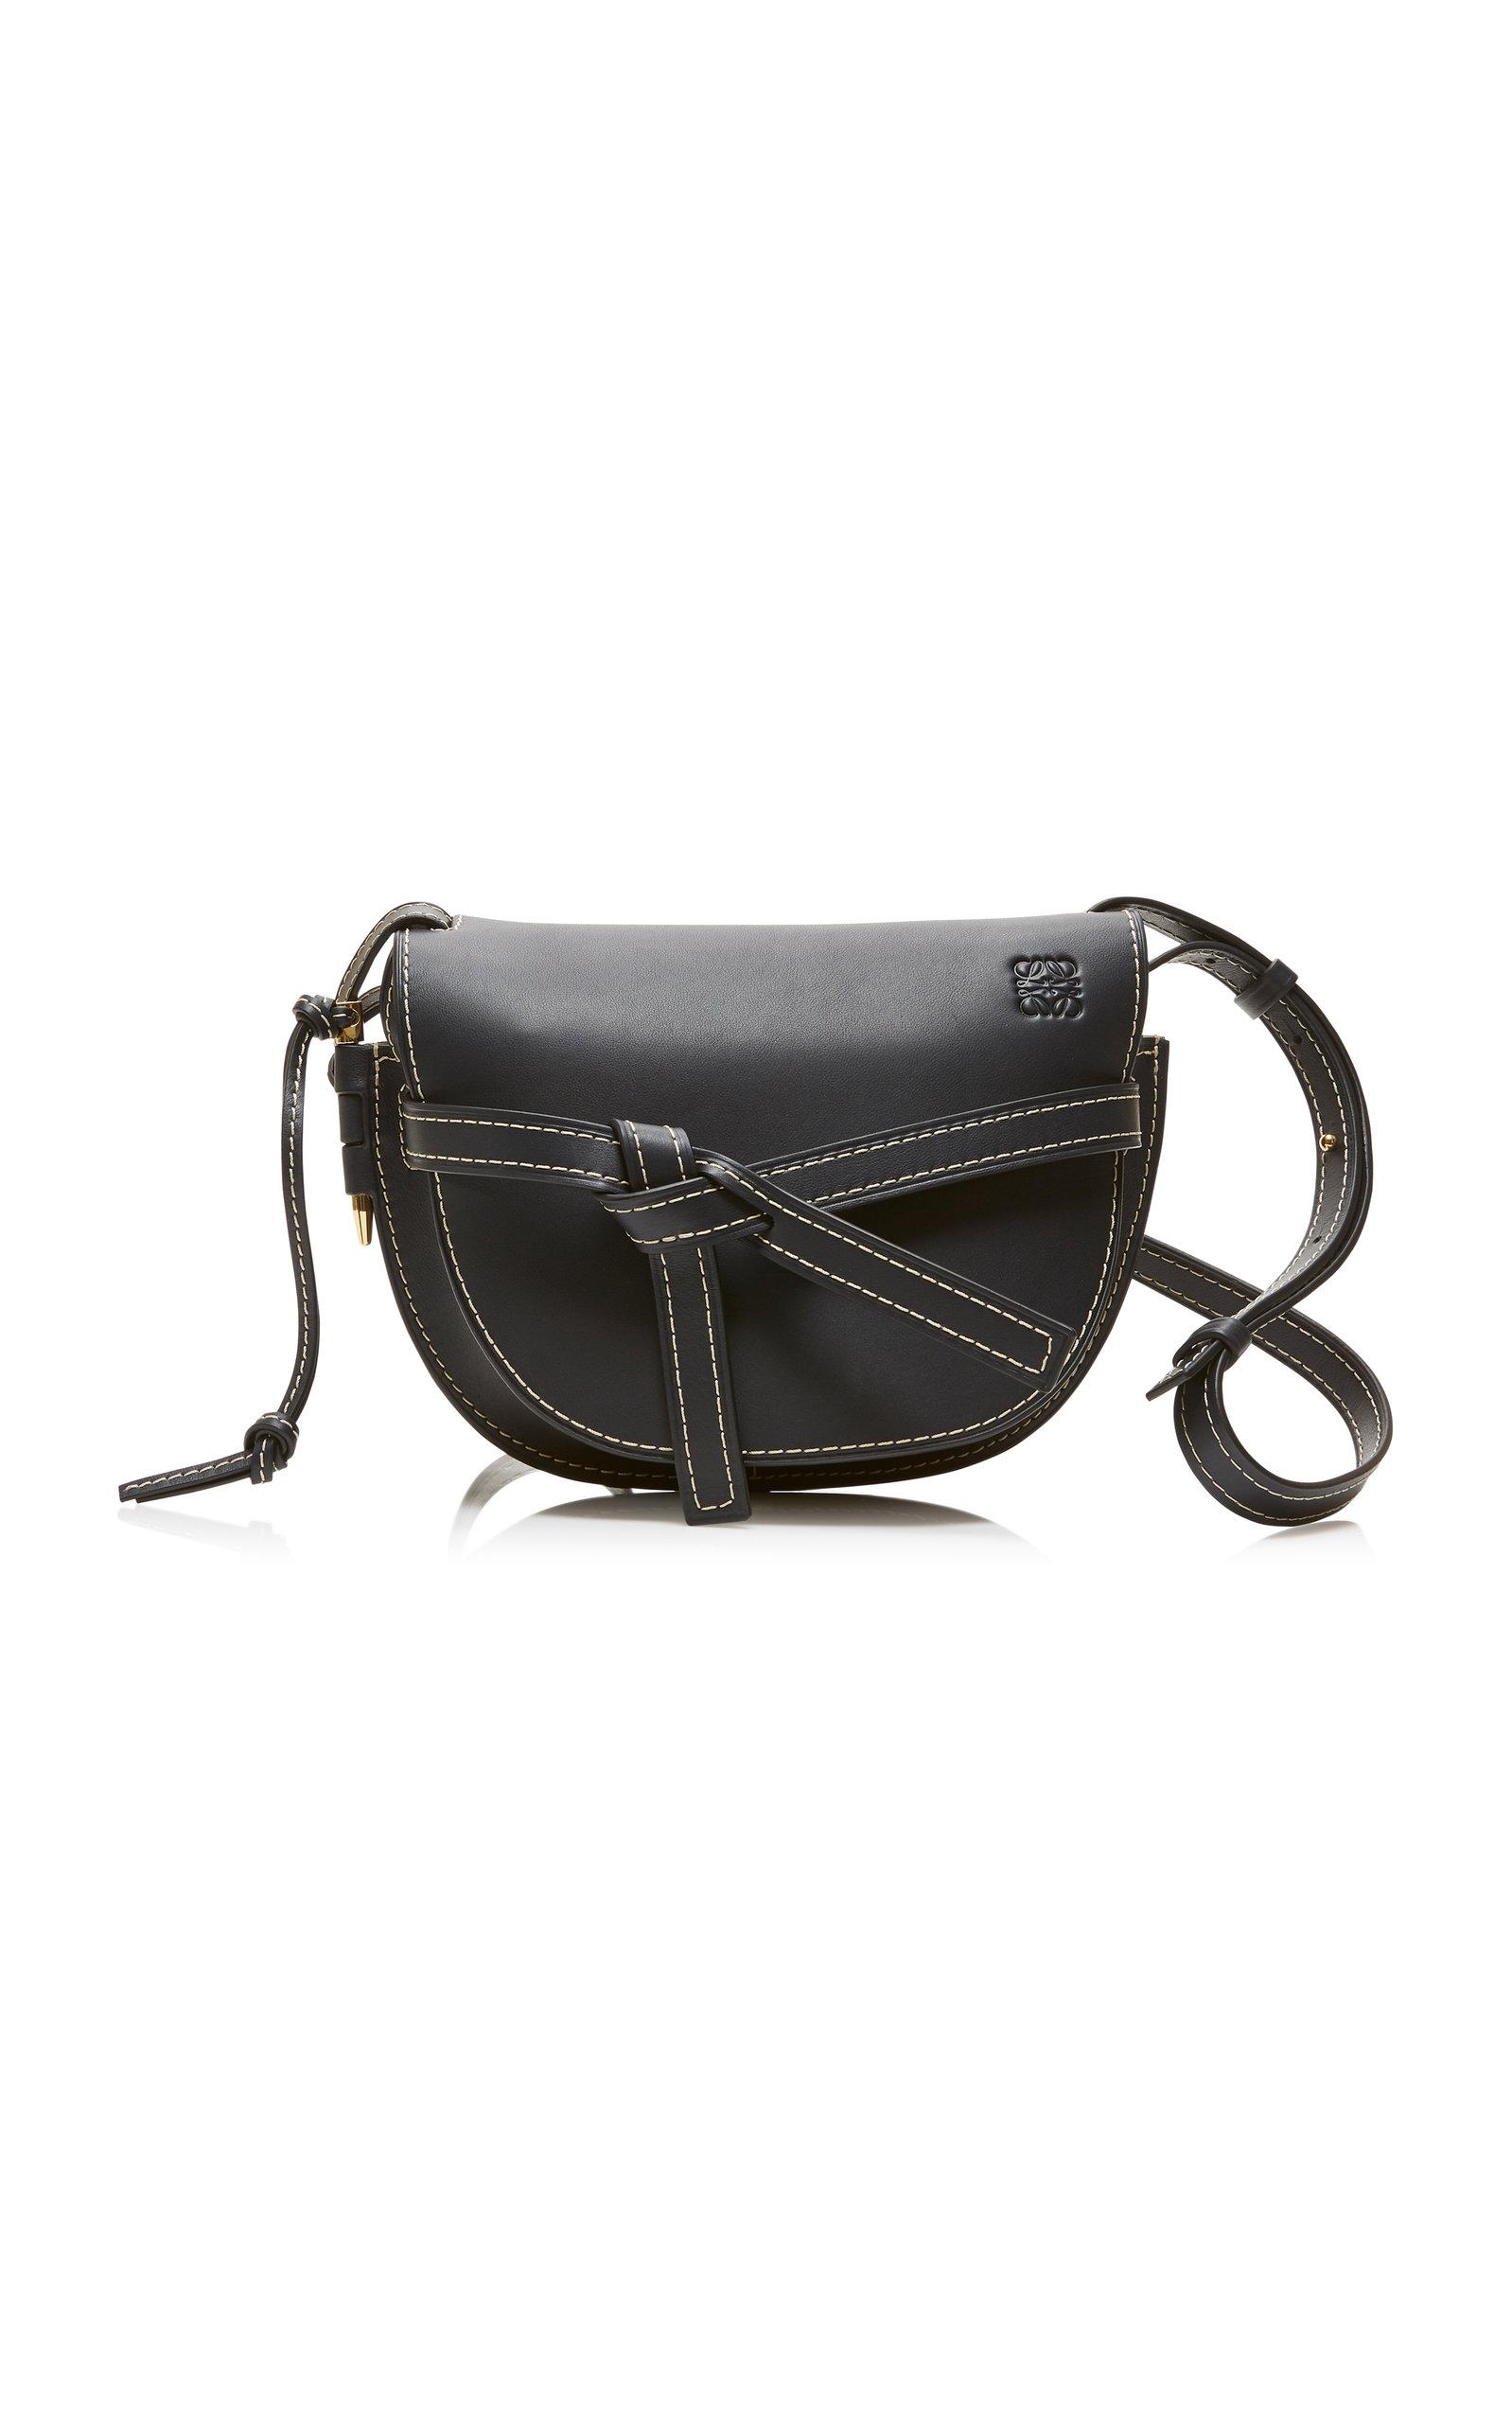 Gate small bag - Black Loewe 5KsLN1Ep